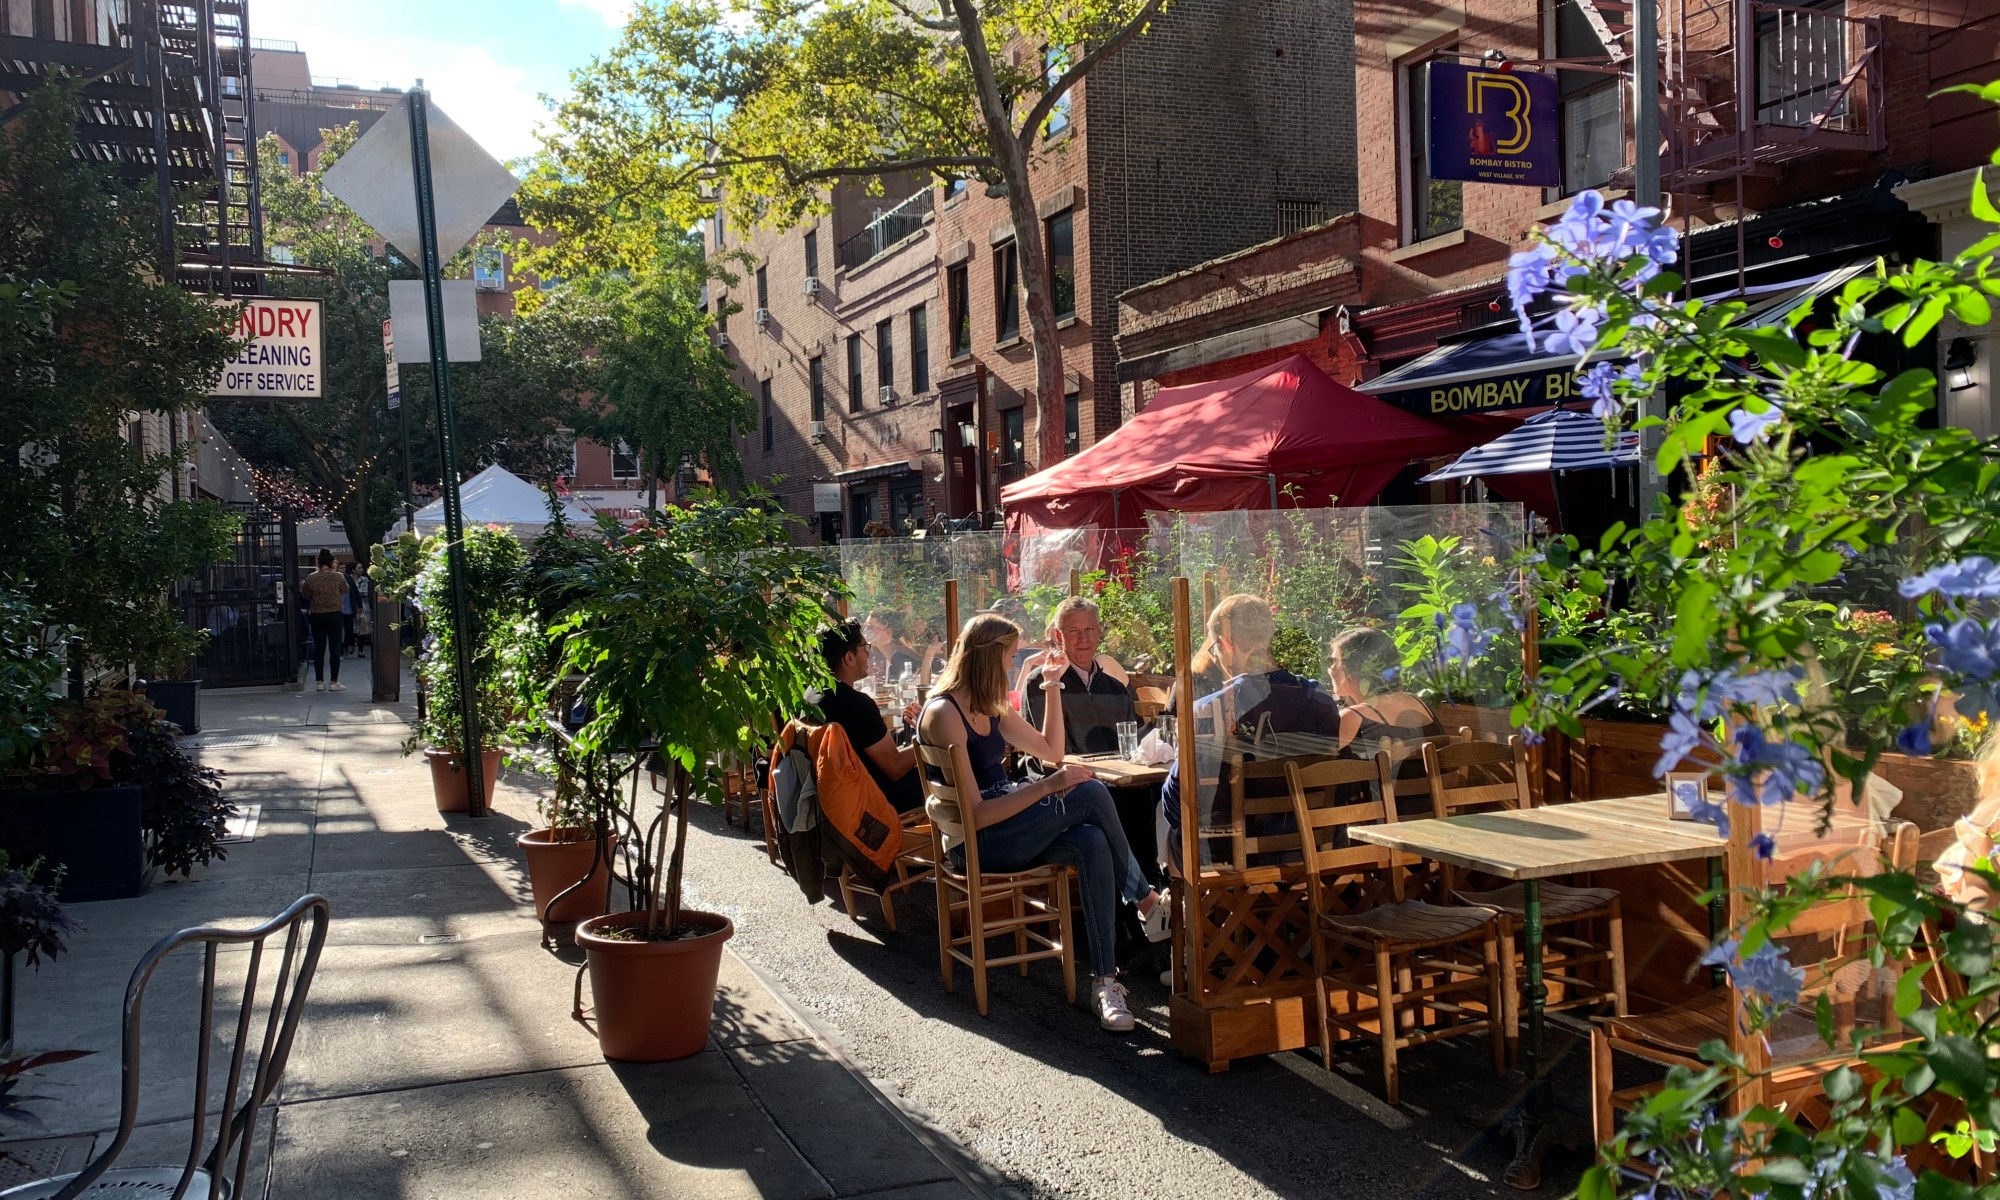 Outdoor Restaurant on Corneila Street